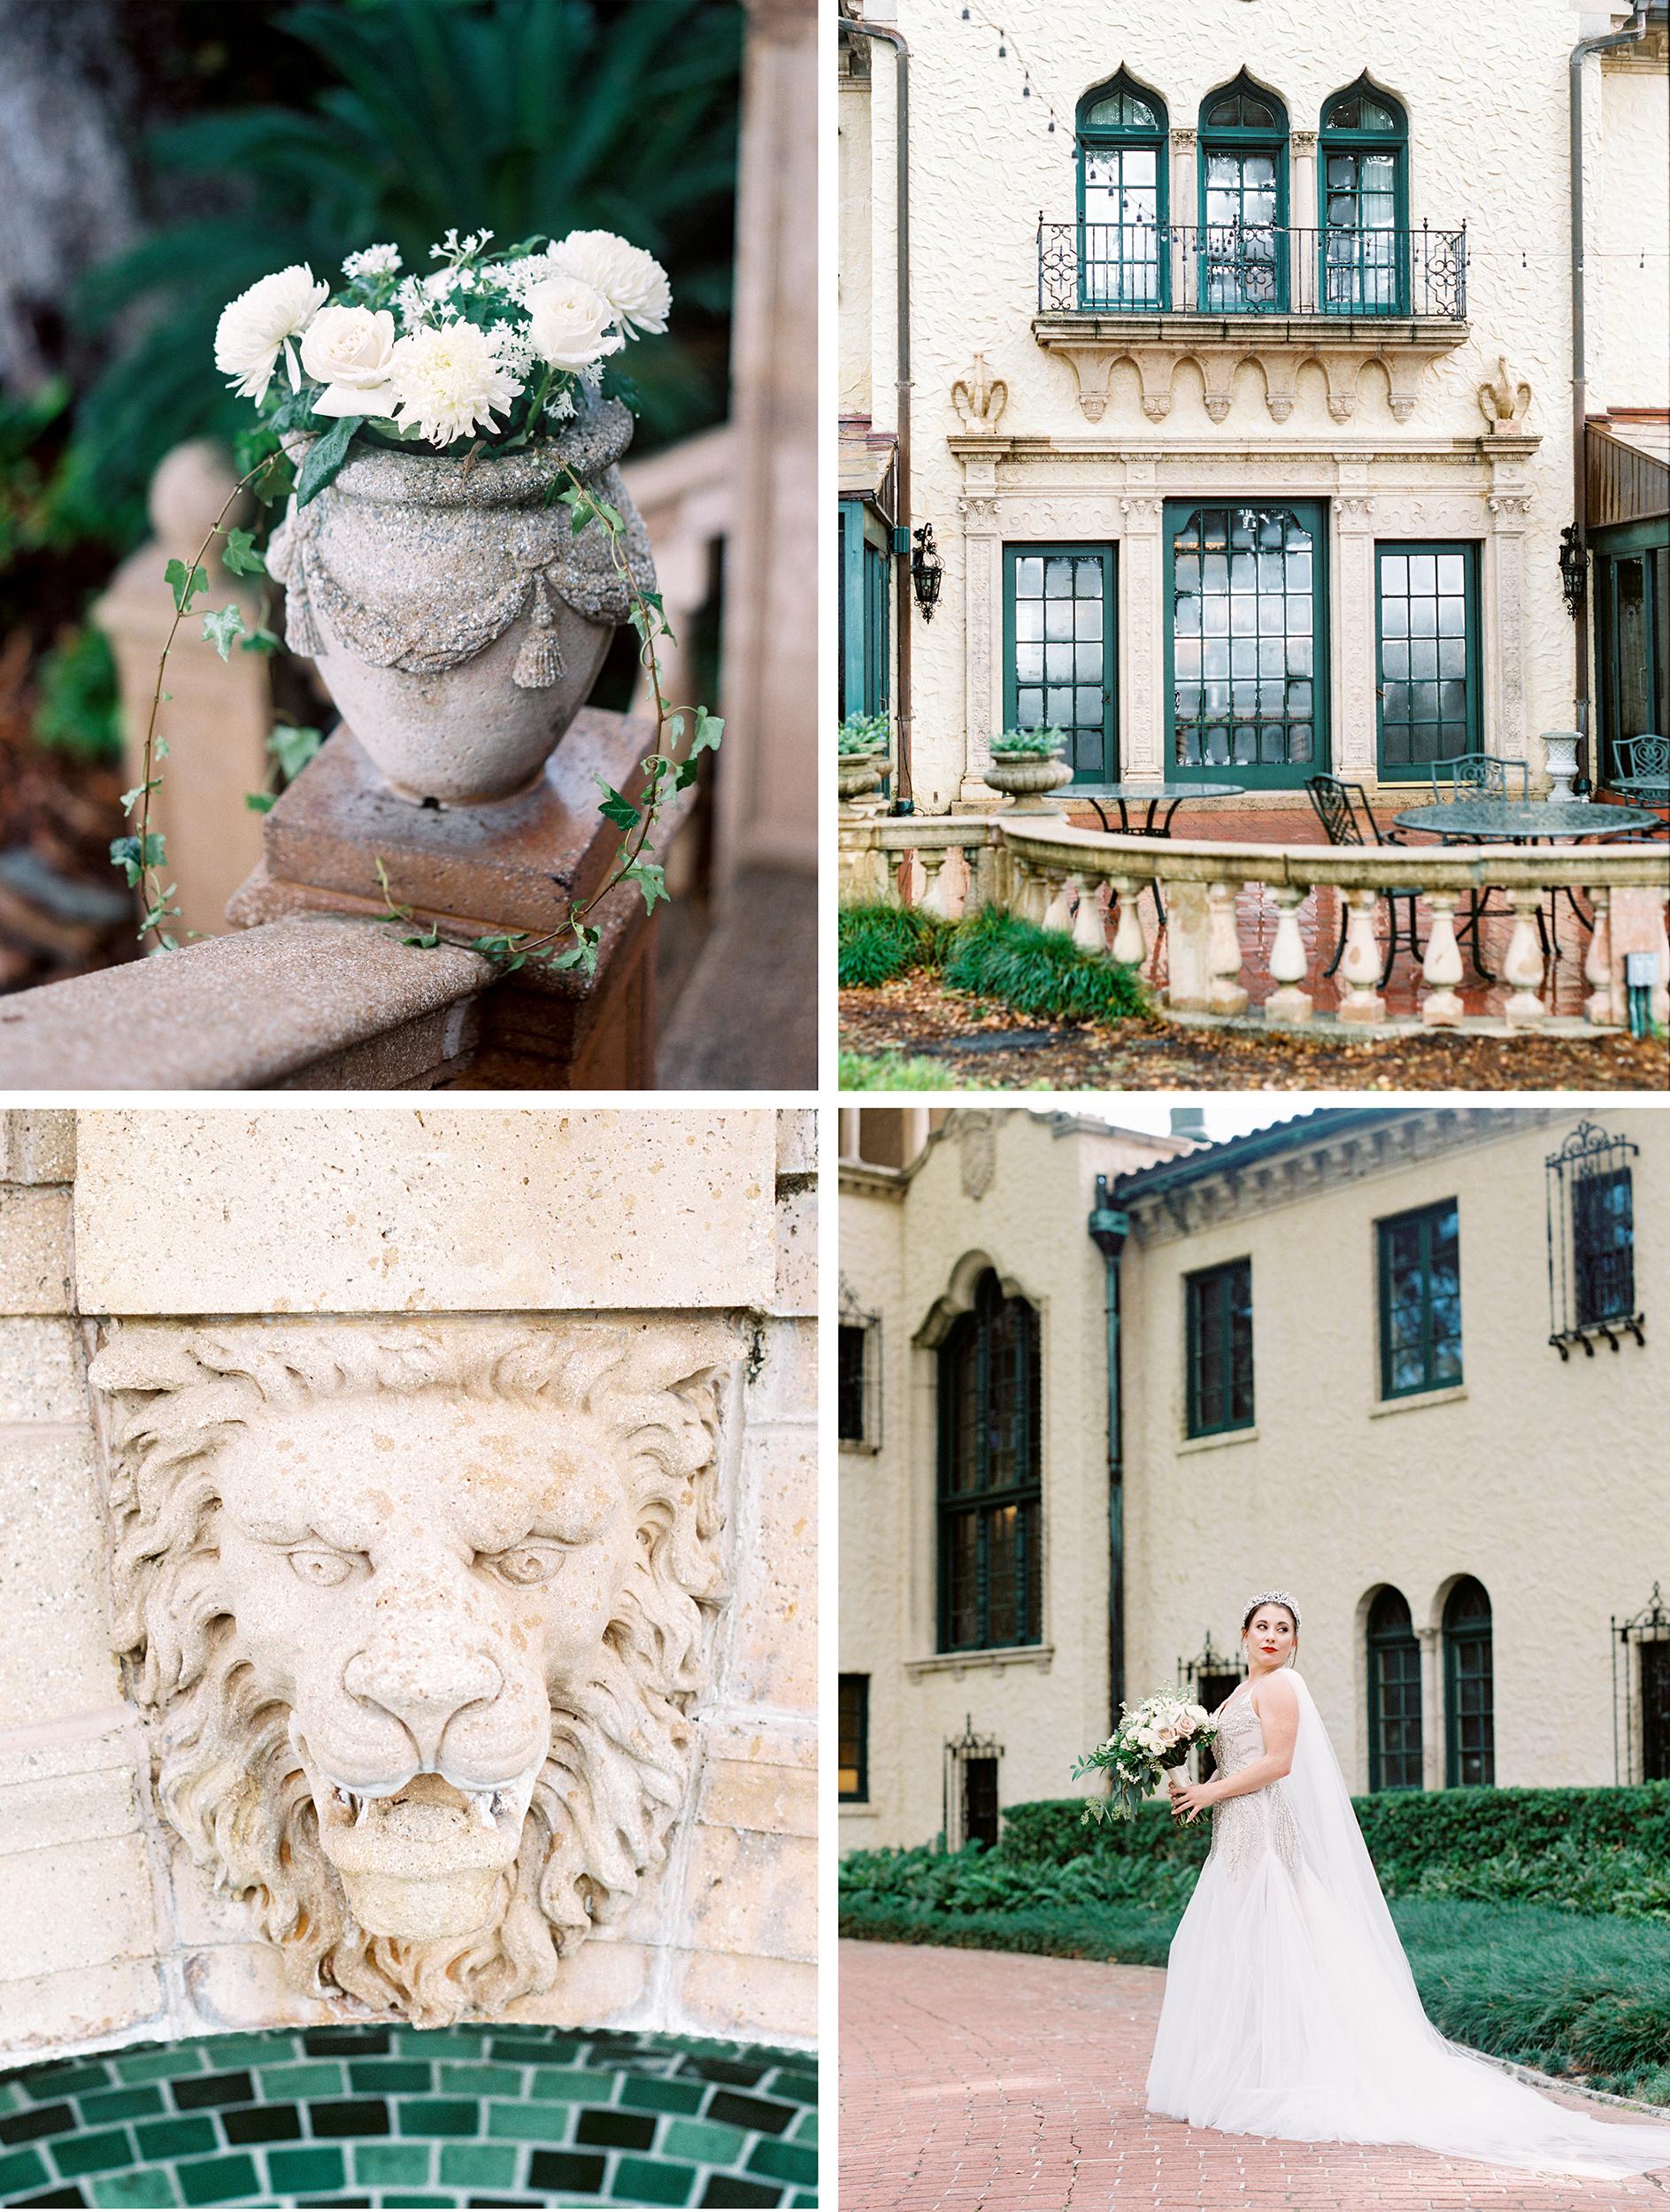 Lisa Silva Photography- Jacksonville, Florida Fine Art Film Wedding Photography Epping Forrest Yacht Club 10.jpg